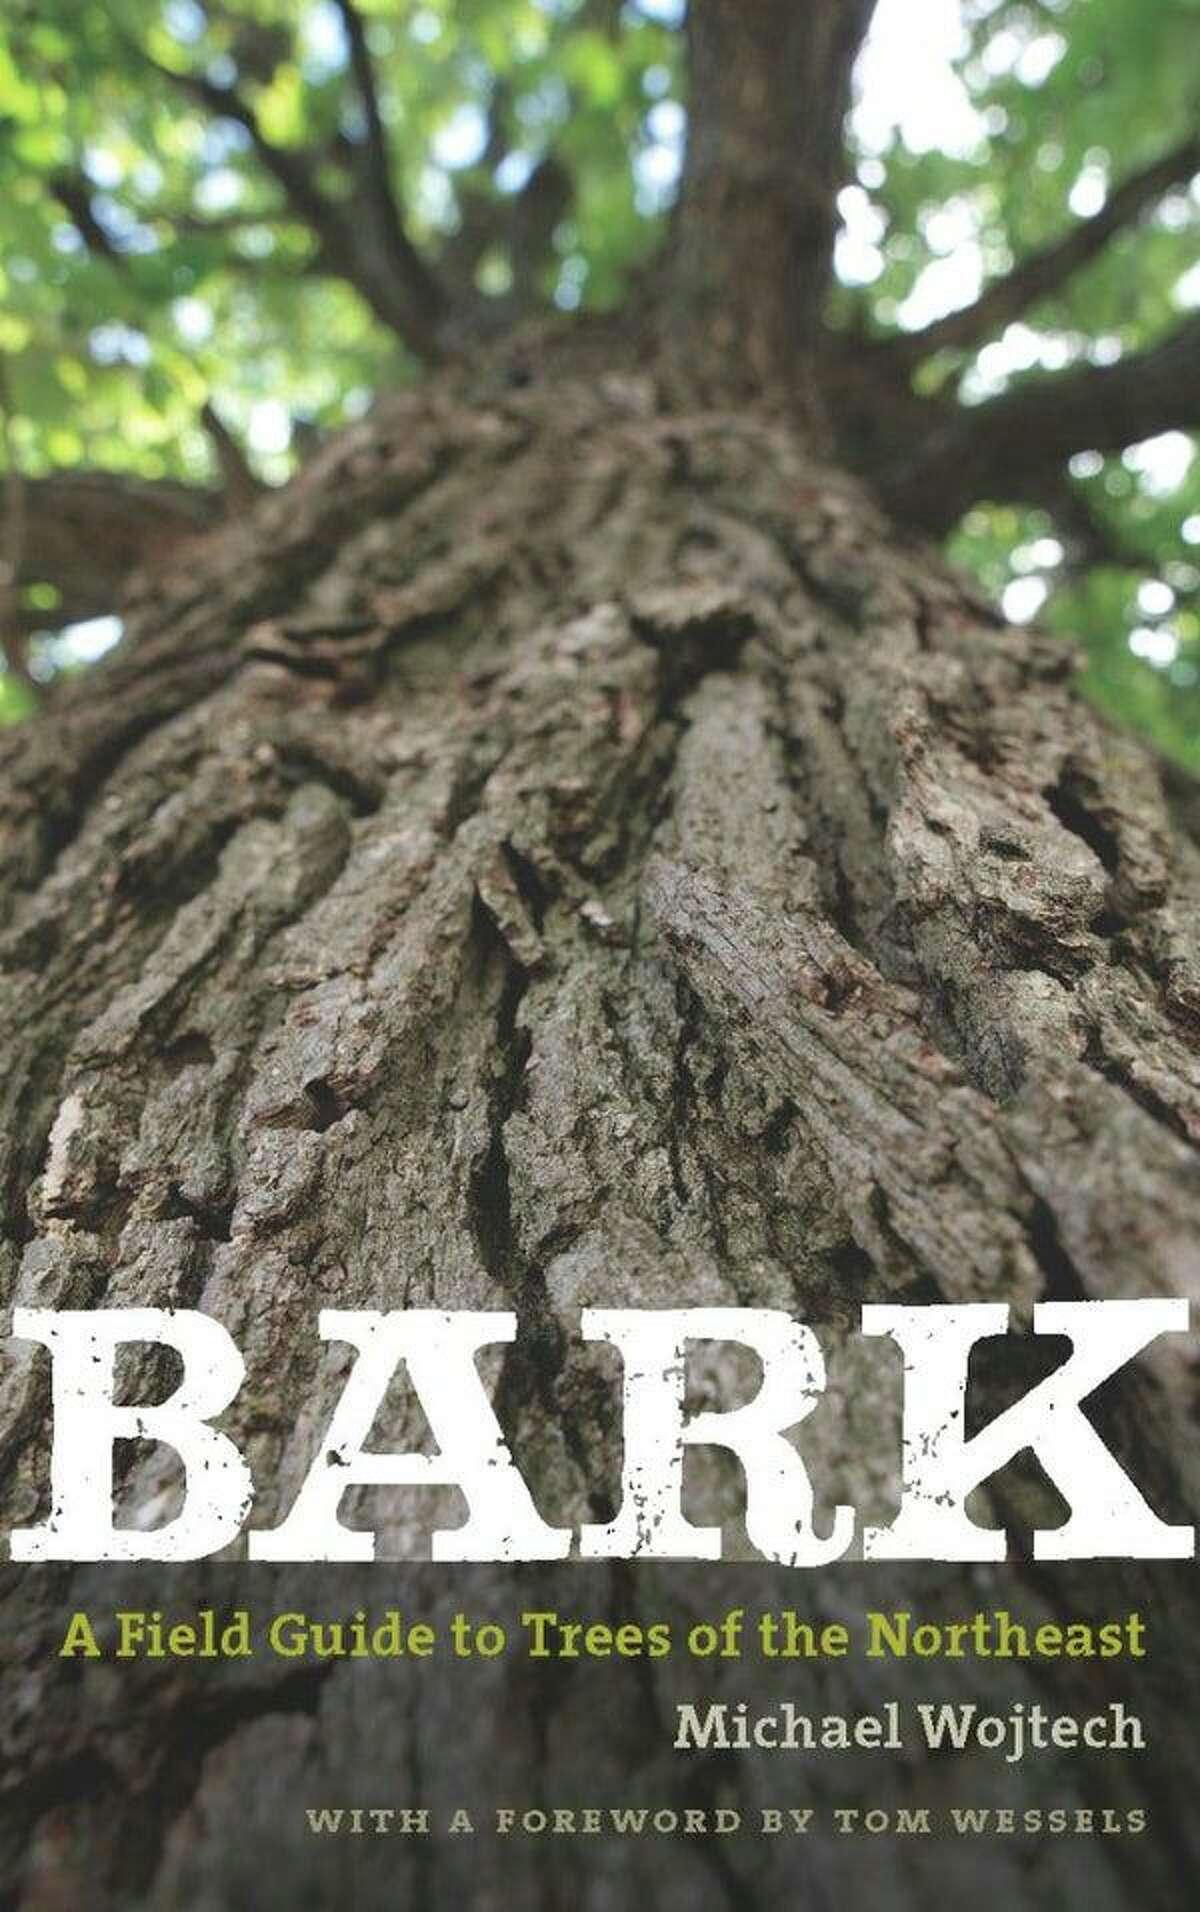 Naturalist Michael Wojtech will be talking about trees at Stamford's Bartlett Arboretum & Gardens Jan. 16.